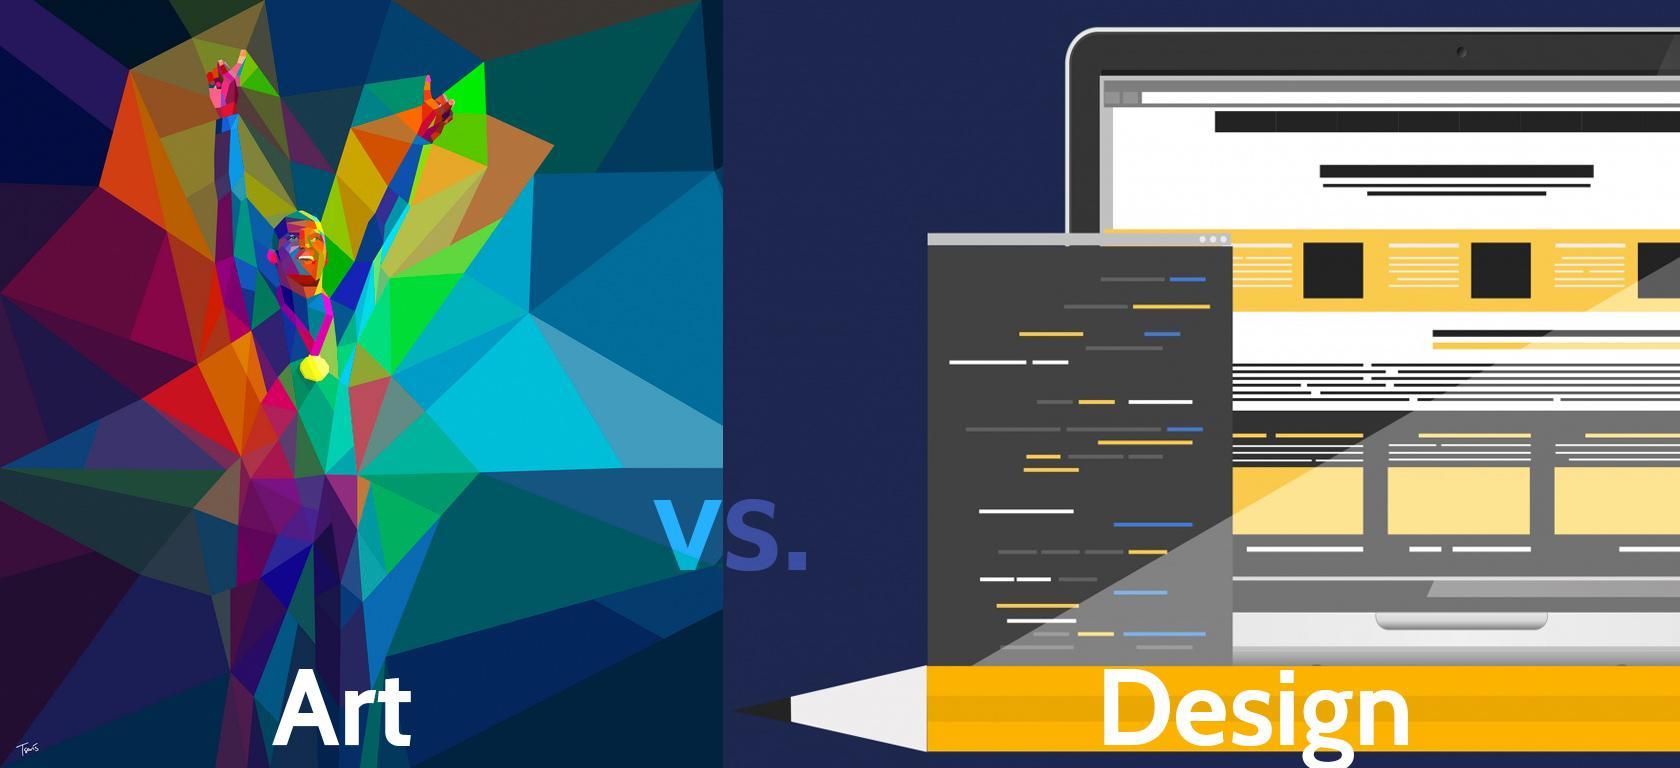 Art vs. Design, objective vs. subjective